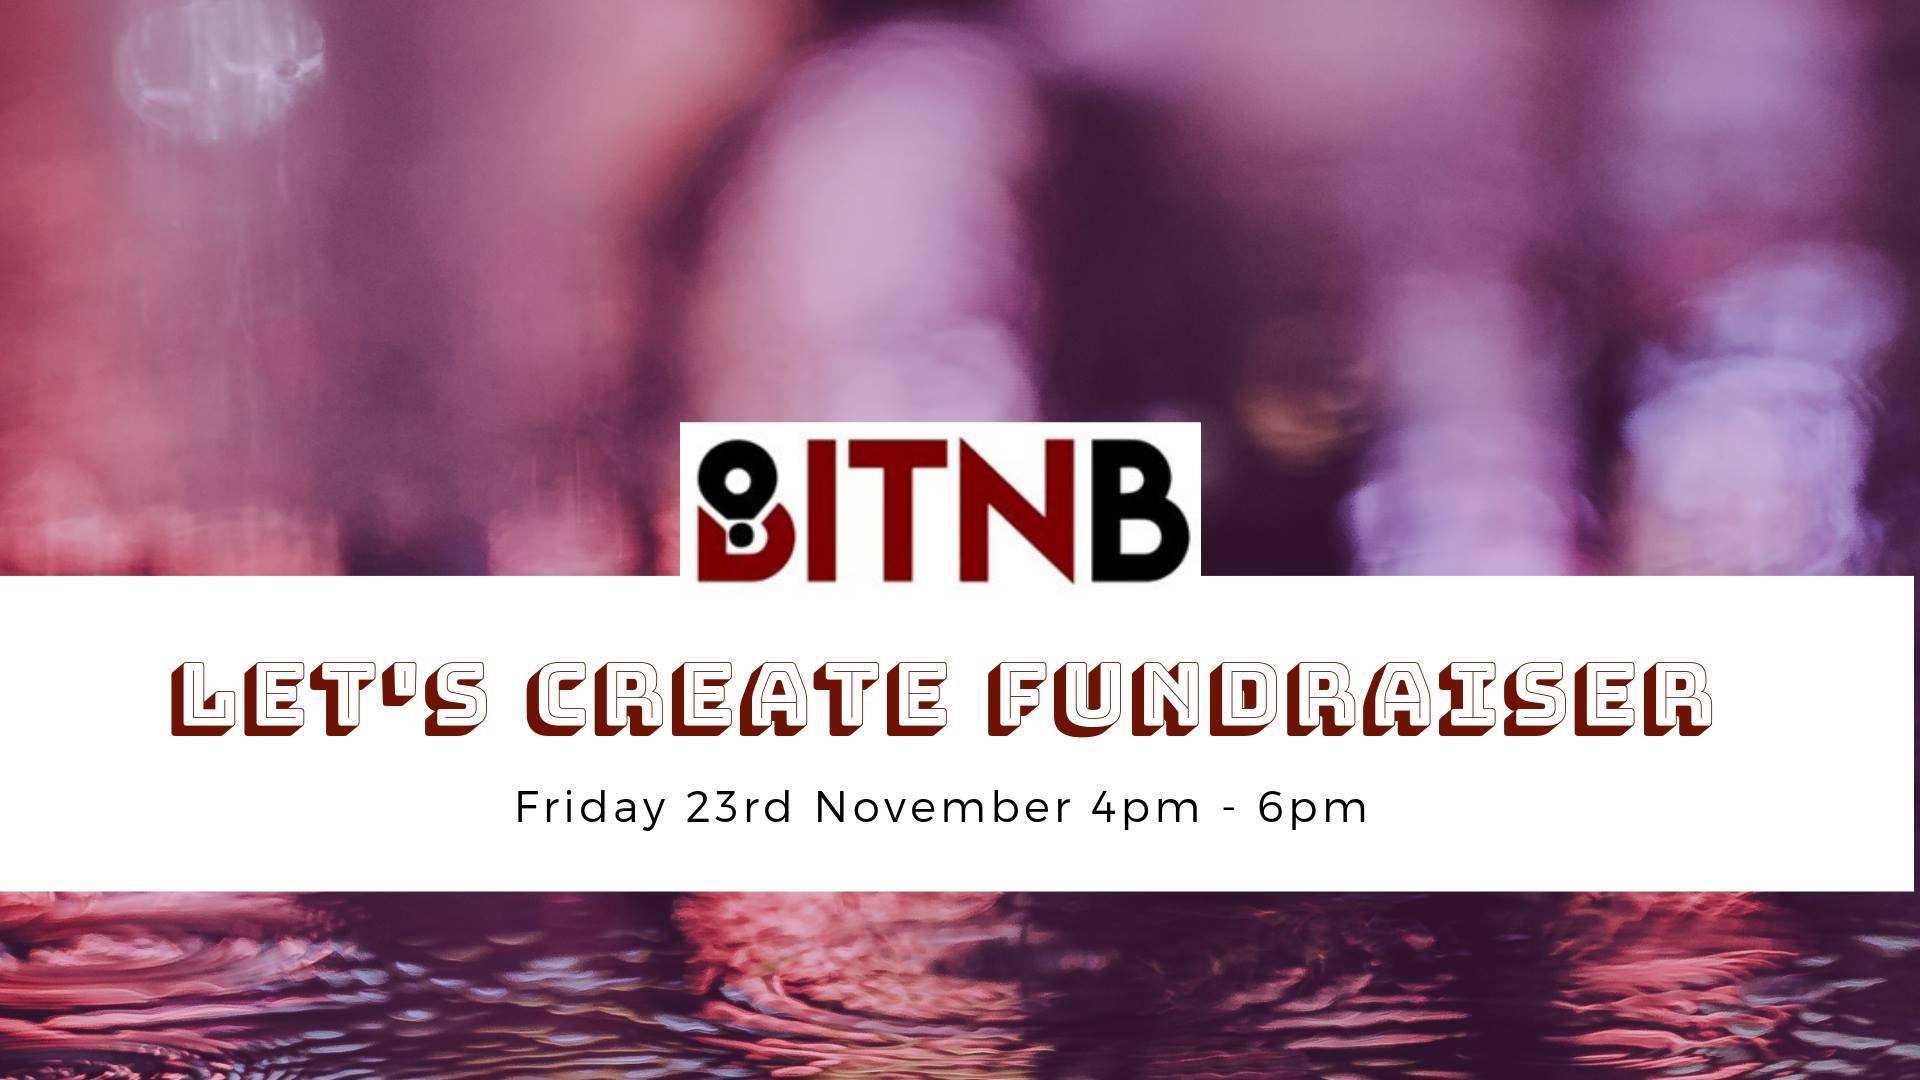 BITNB Let's Create Fundraiser